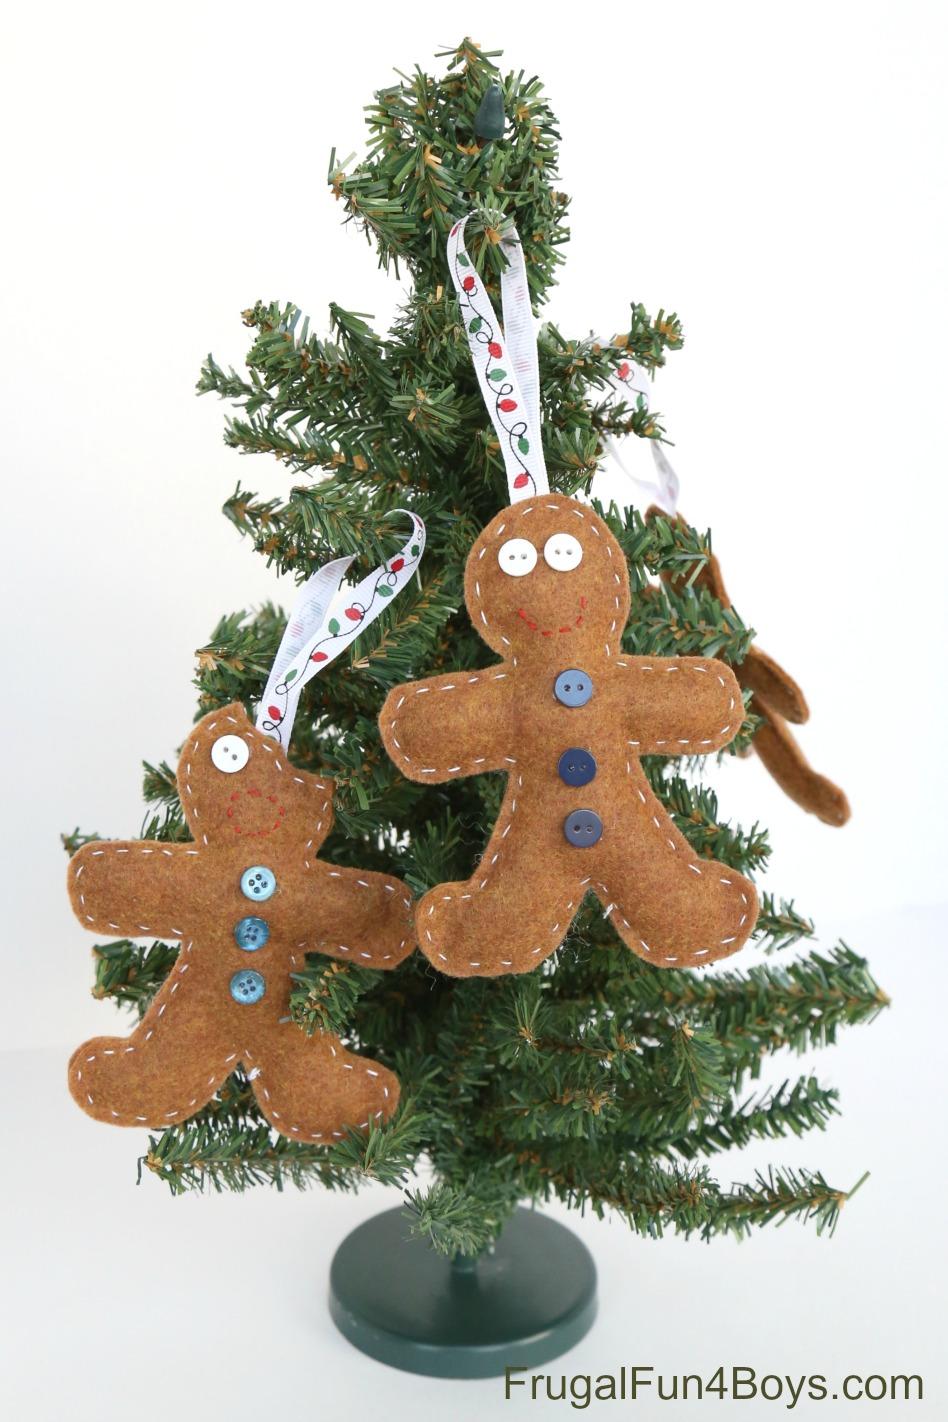 Felt Gingerbread Ornaments for Kids to Make